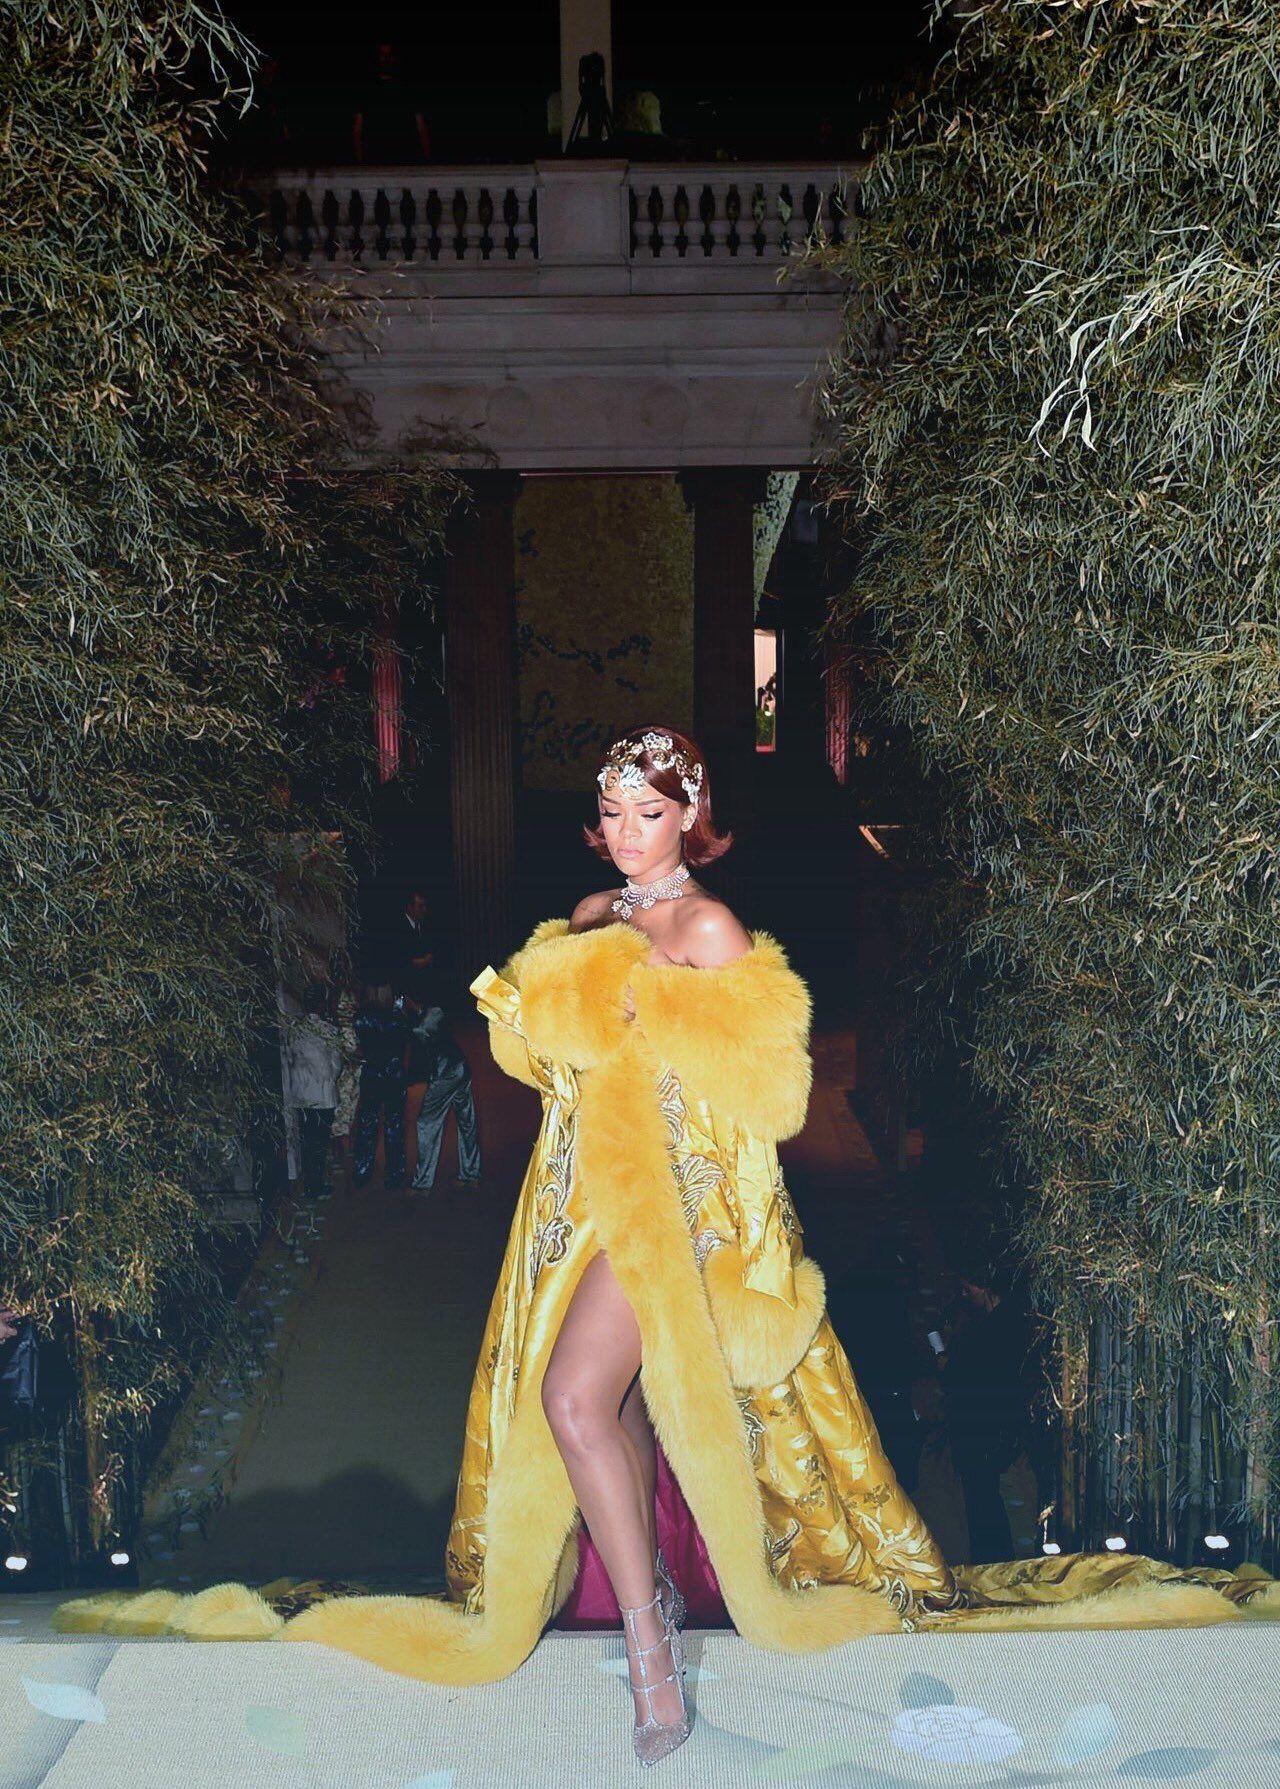 Yellow dress rihanna  ITS MET GALA DAY hereus one of my favourite met looks ever